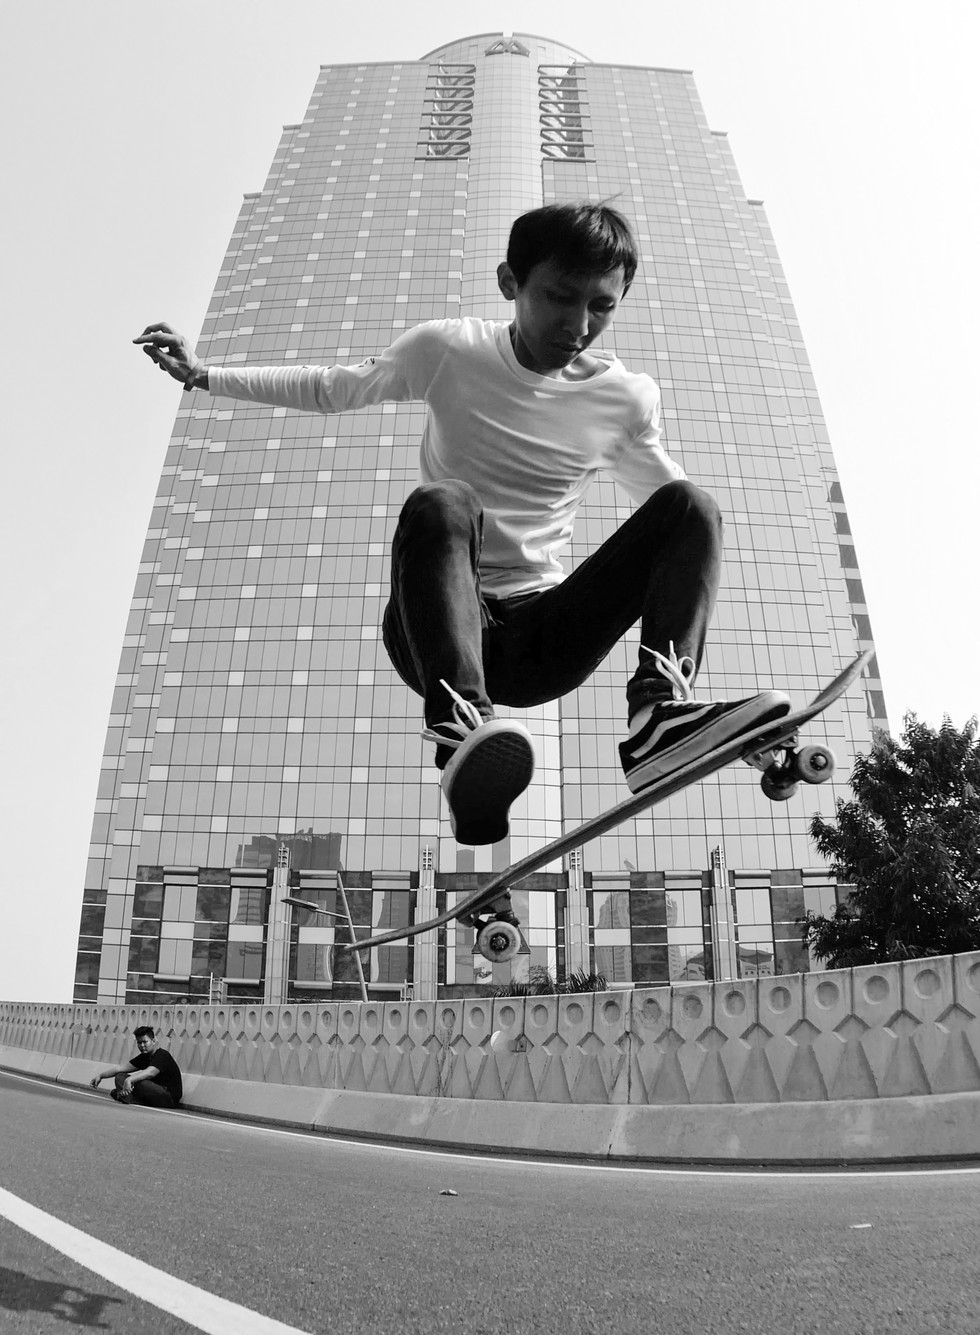 Antonyus Bunjamin_Skateboard Jump at Sem